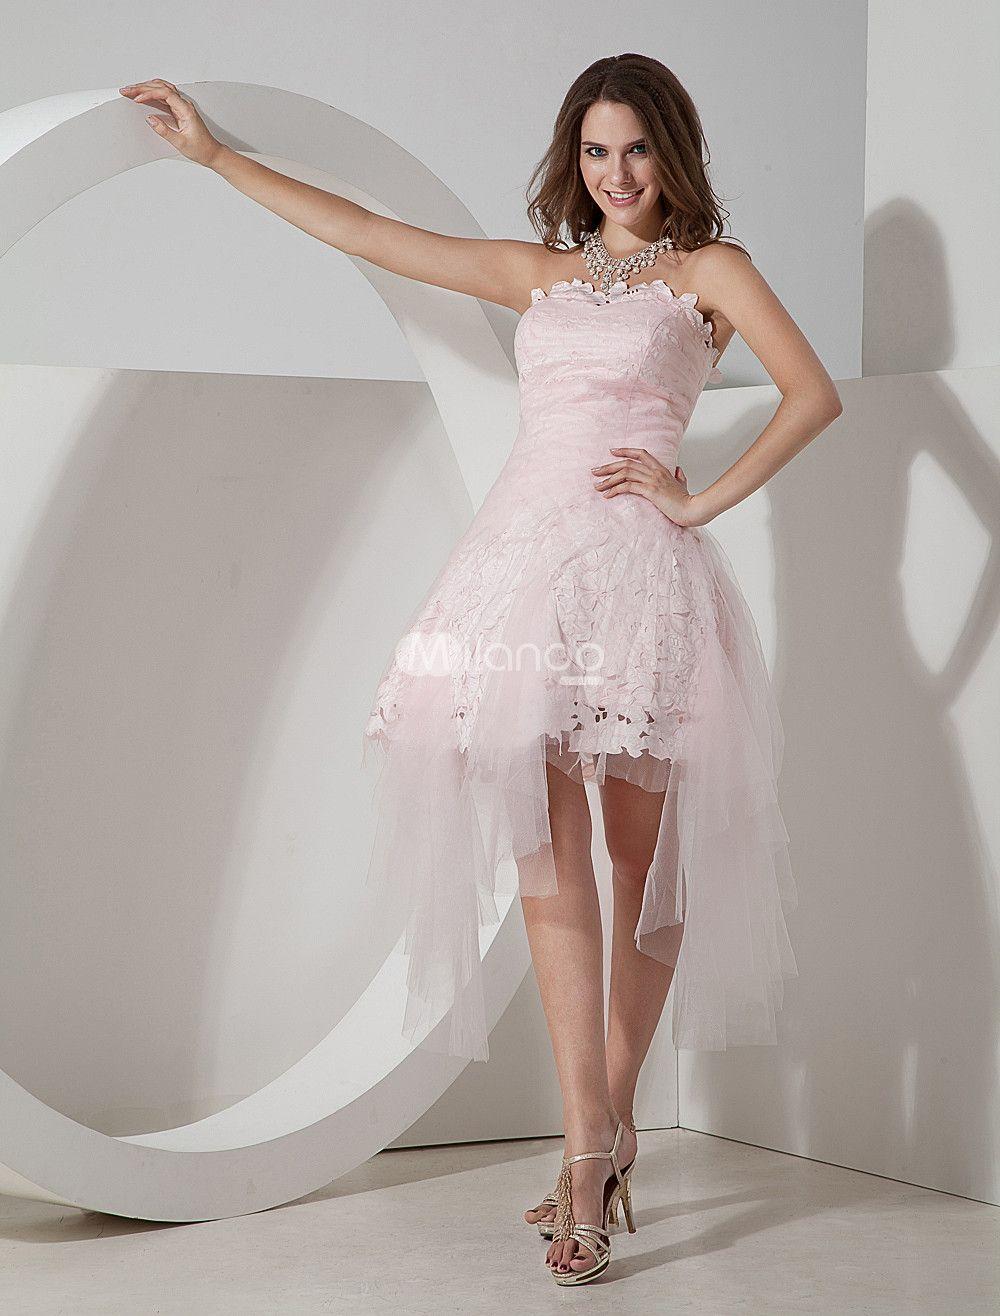 28eb99091e41 Prom Mafia» Blog Archive » Homecoming Pink | Pink Prom Dresses ...